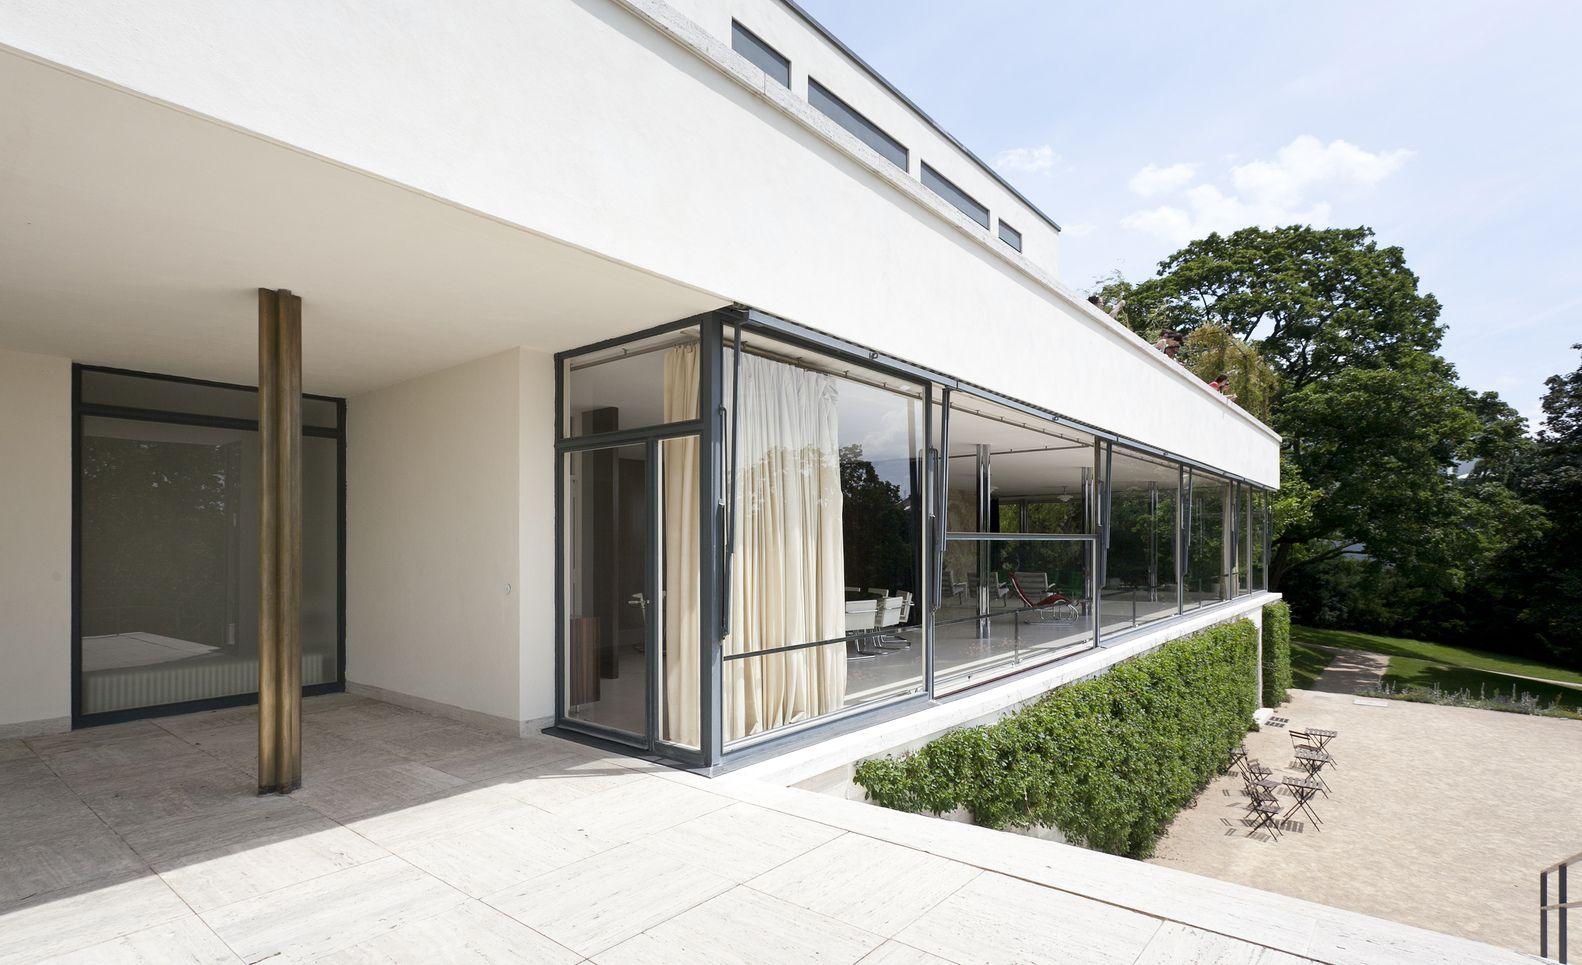 Gallery Of Ad Classics Villa Tugendhat Mies Van Der Rohe 26 Mies Van Der Rohe Ludwig Mies Van Der Rohe Van Der Rohe